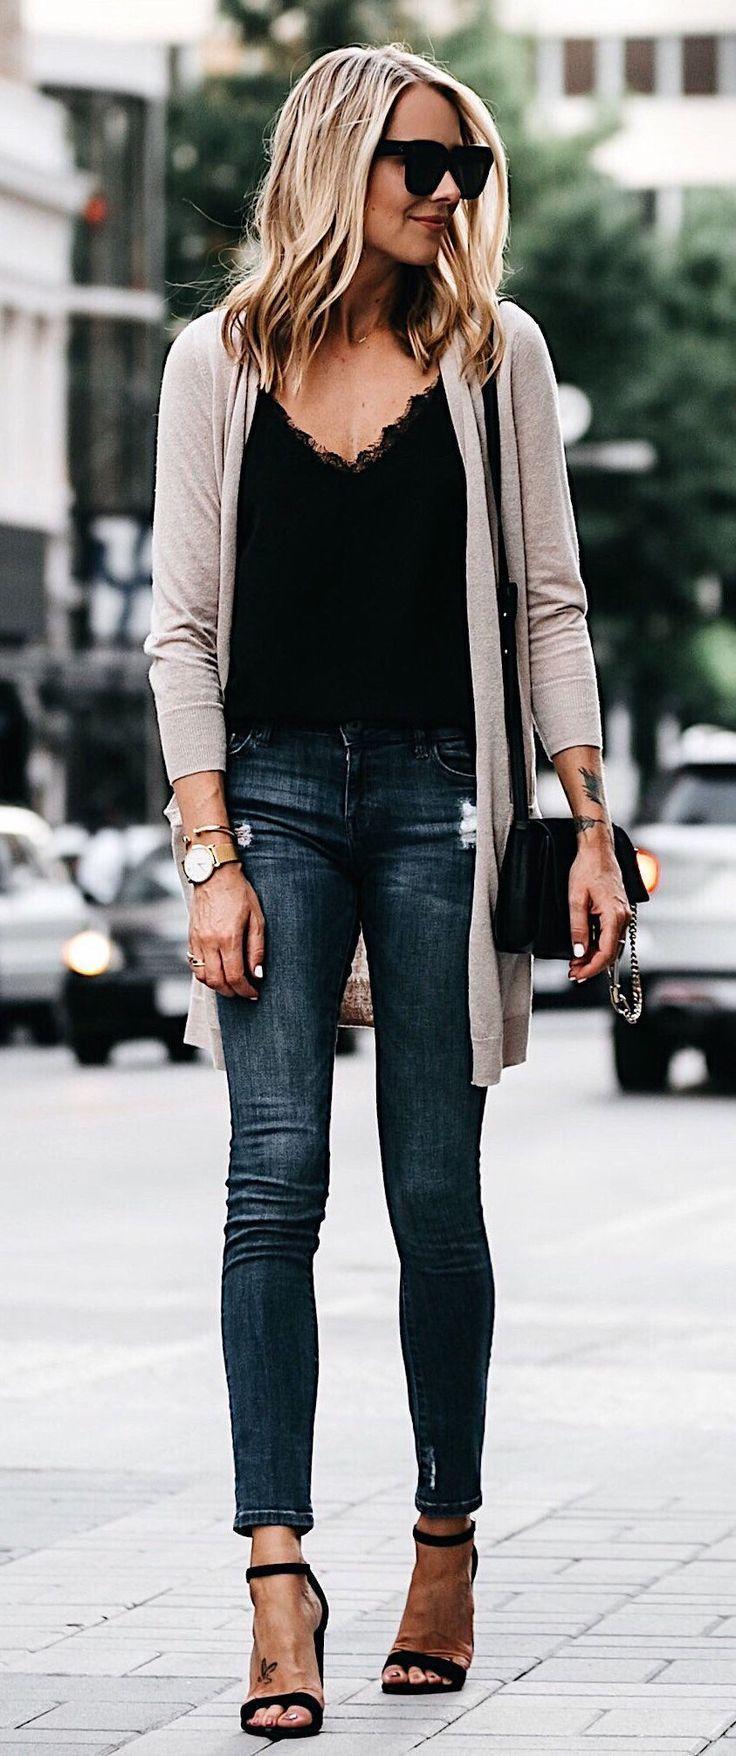 Sloane Ranger Style #ladiesfashion,